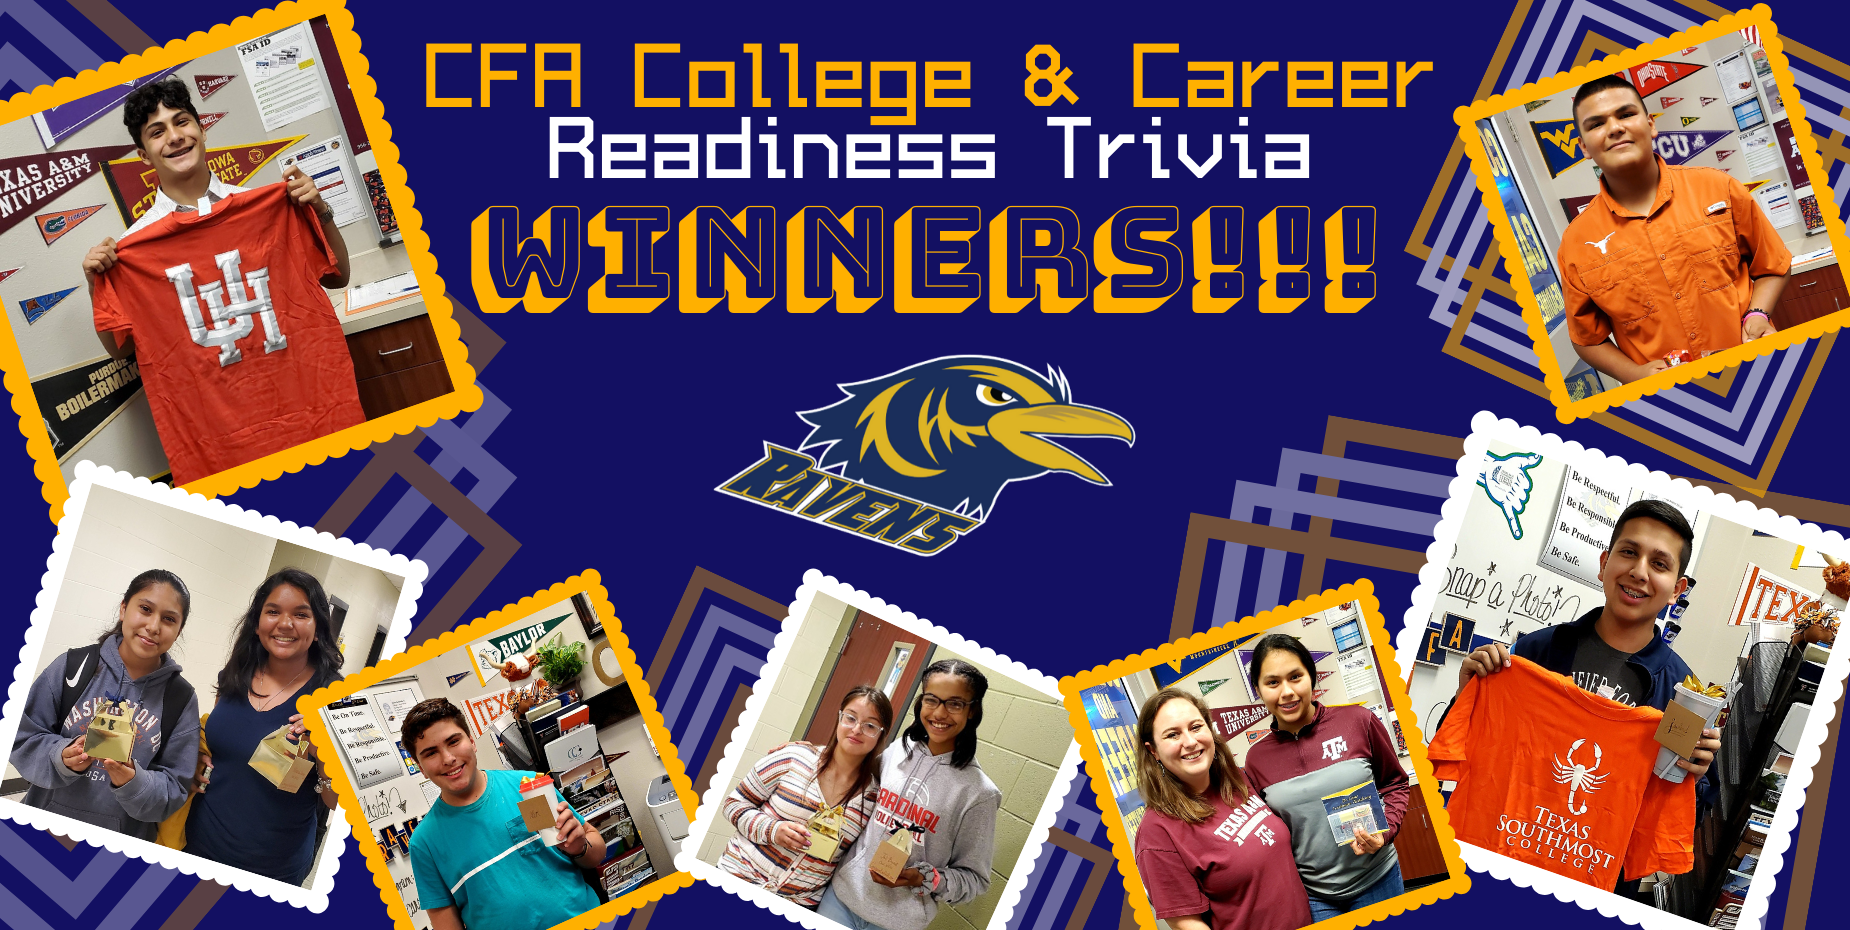 Readiness Trivia Winners